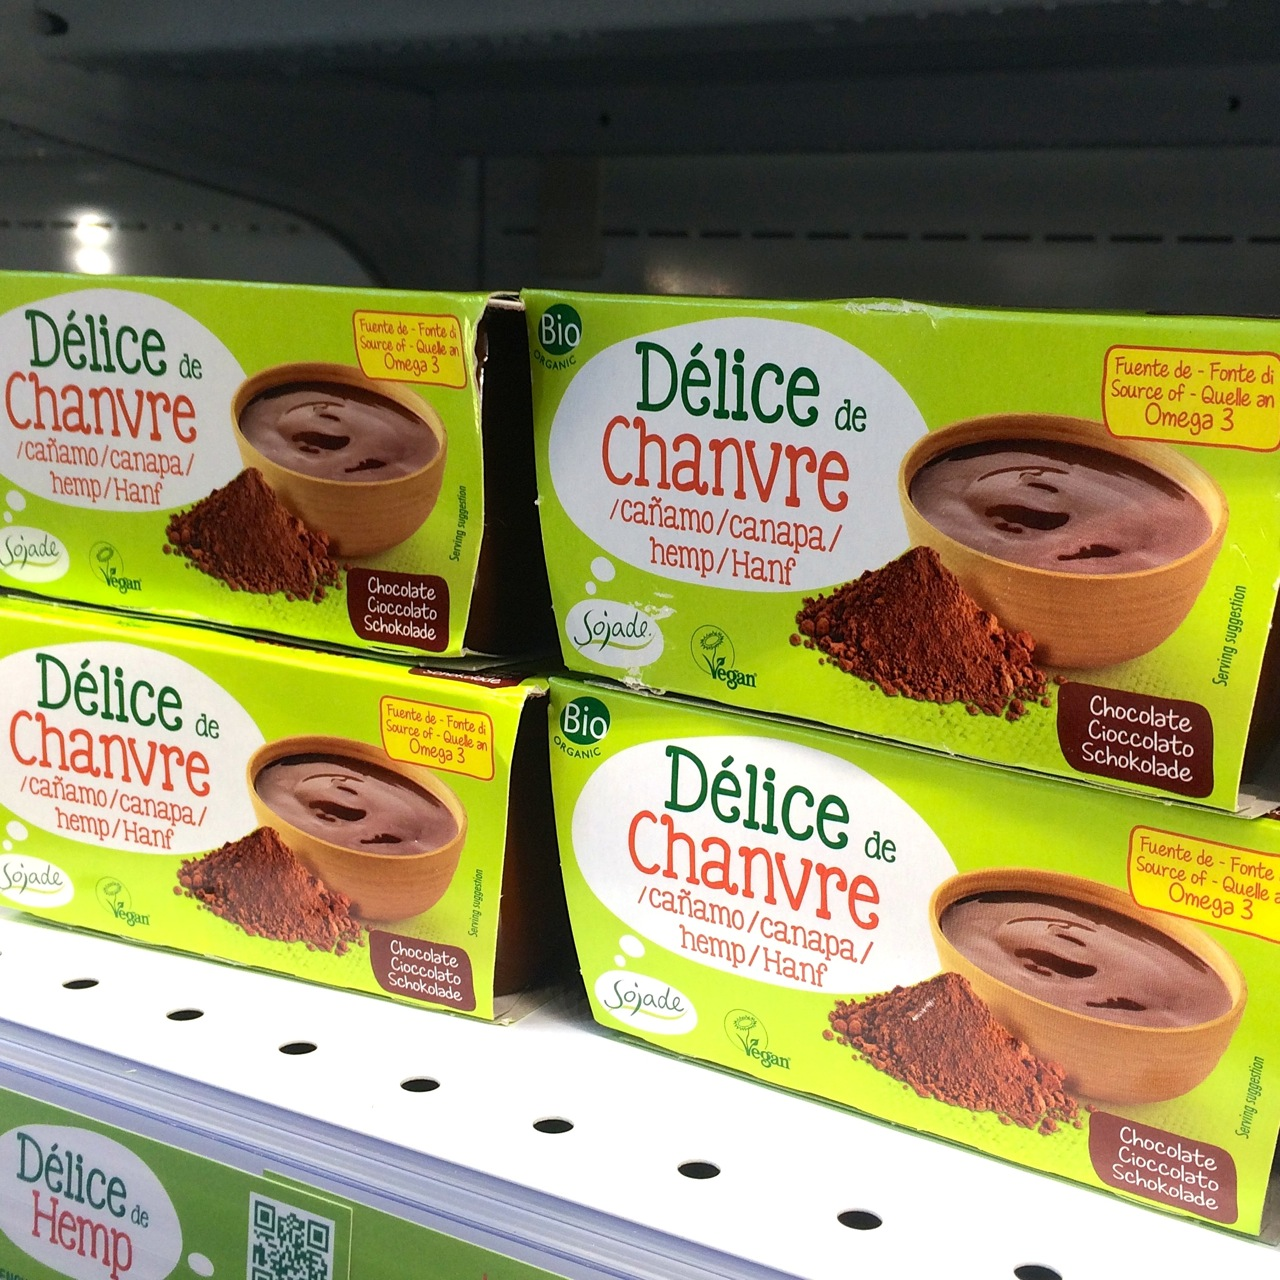 https://i2.wp.com/fatgayvegan.com/wp-content/uploads/2015/07/Chocolate-hemp-pudding-at-Just-V-Show.jpg?fit=1280%2C1280